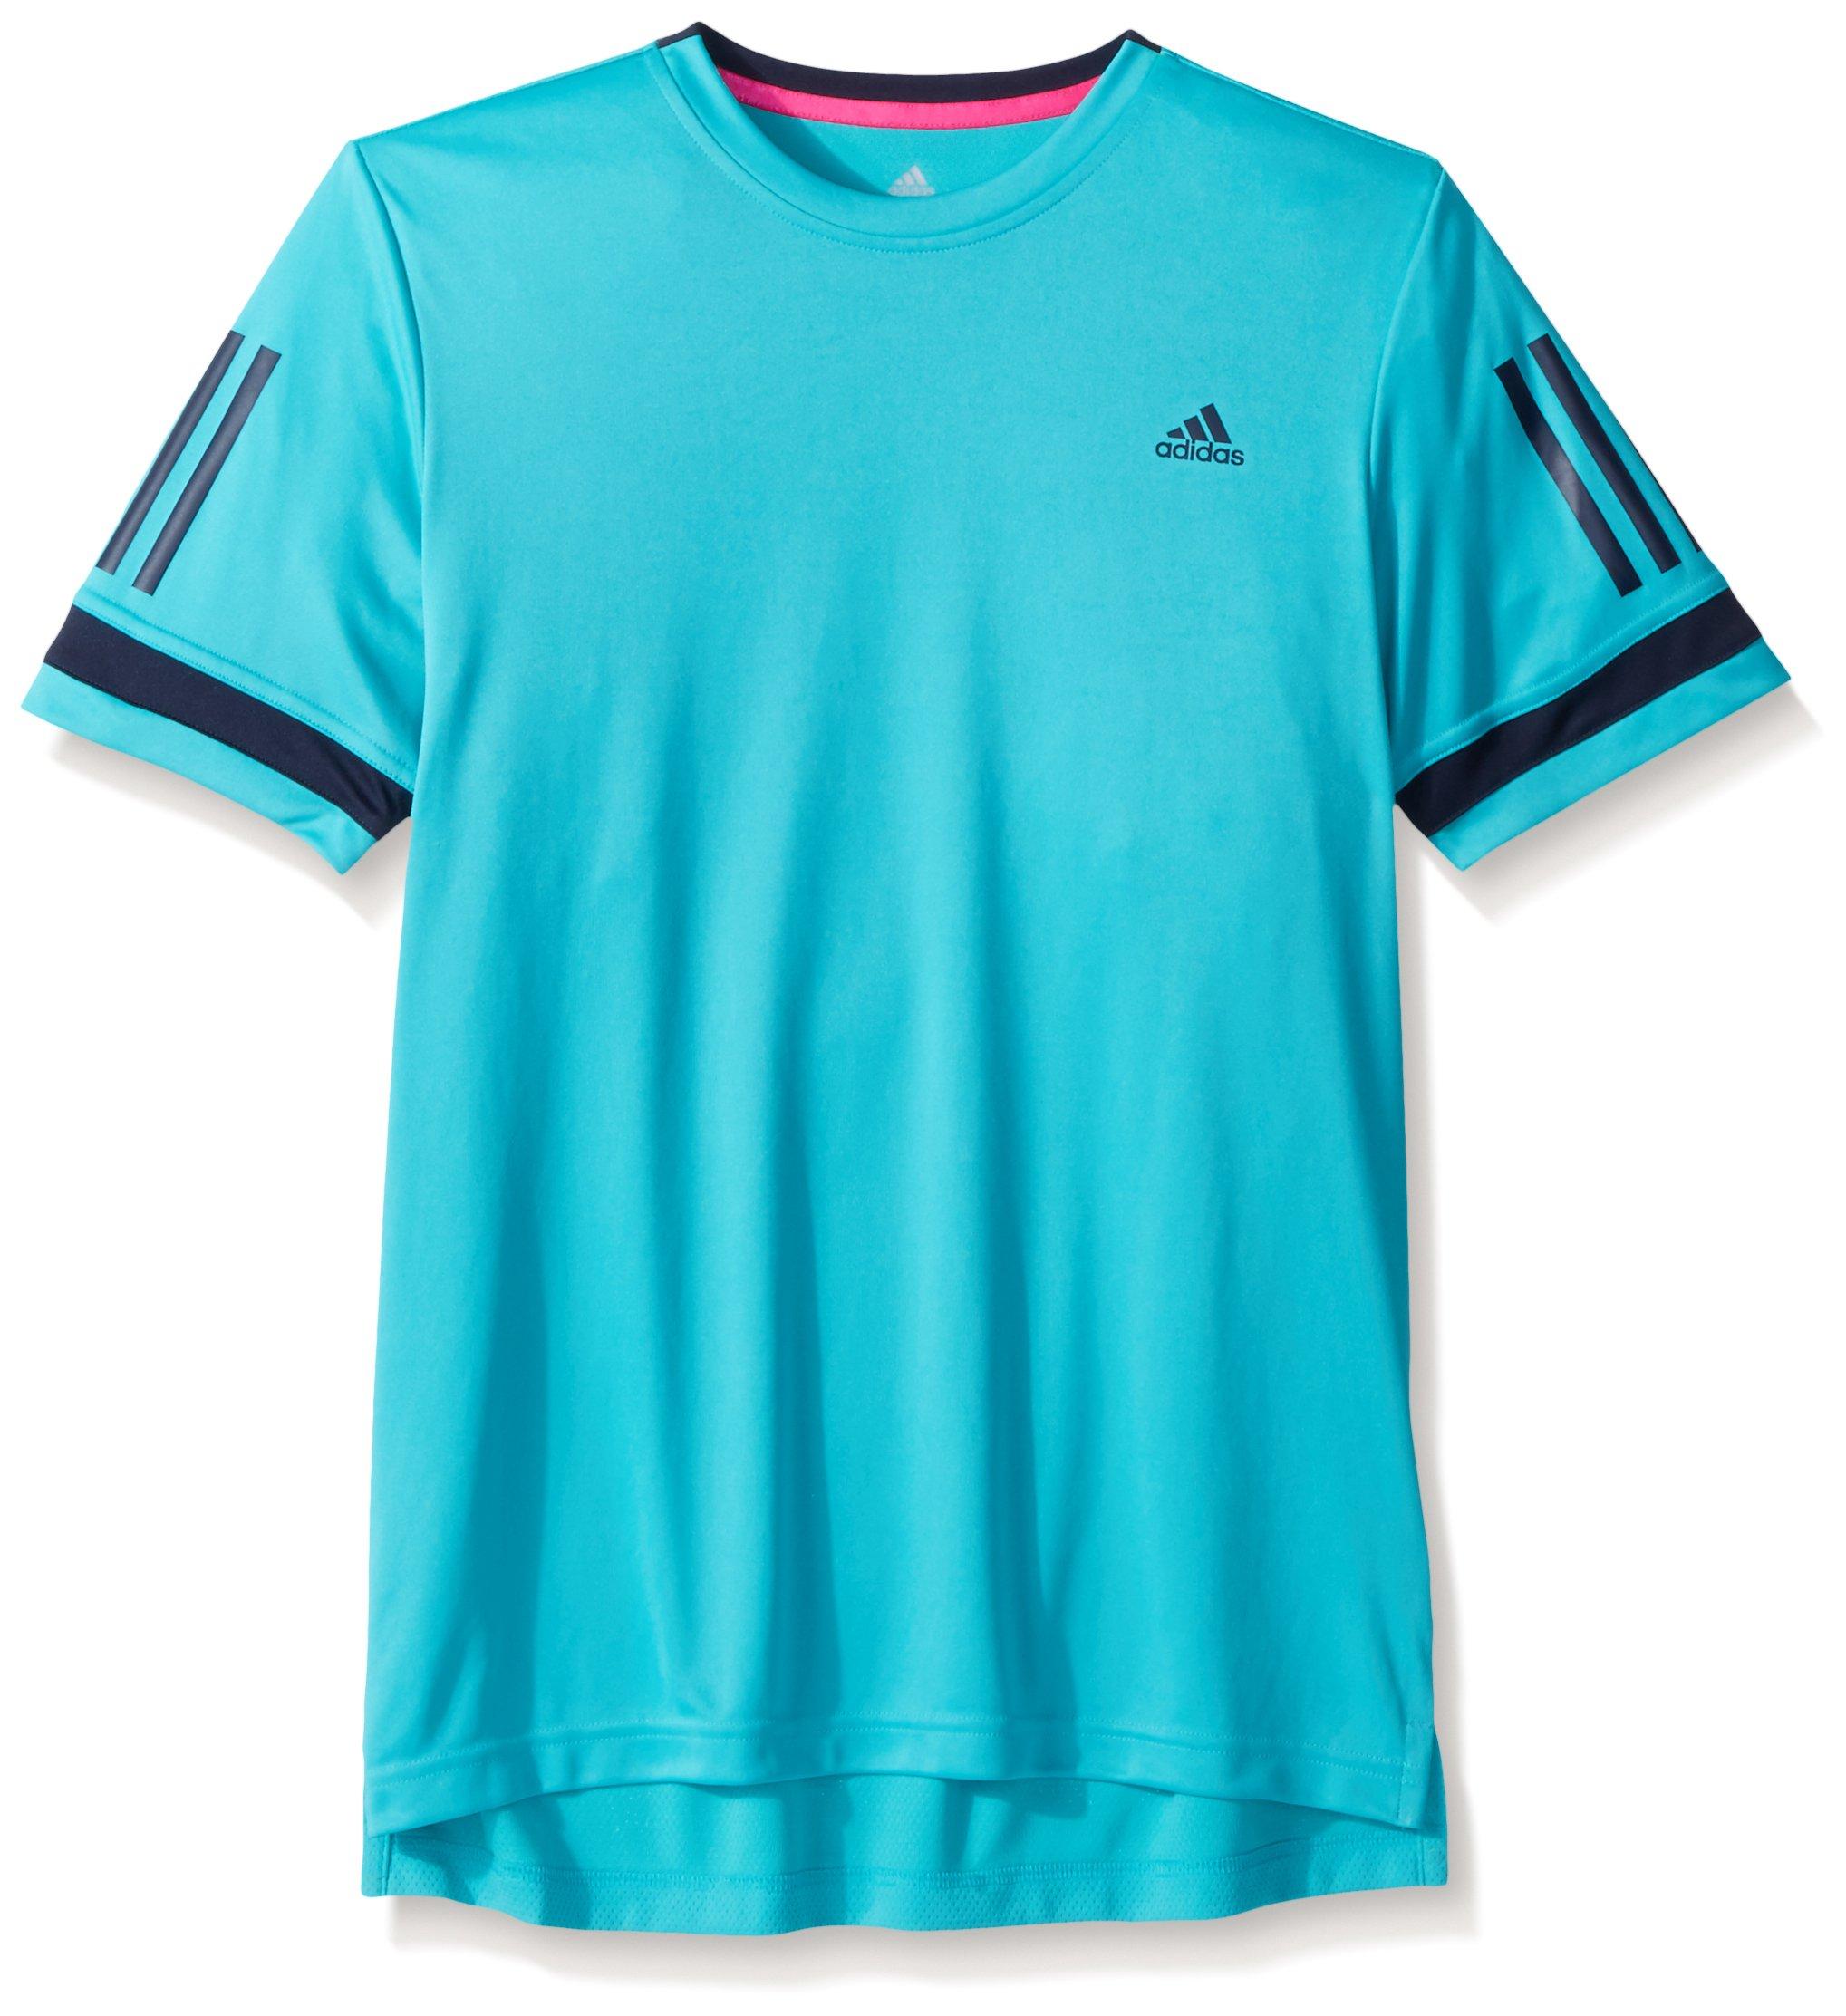 adidas Tennis Club 3 Stripes Tee, Hi-Res Aqua, X-Large